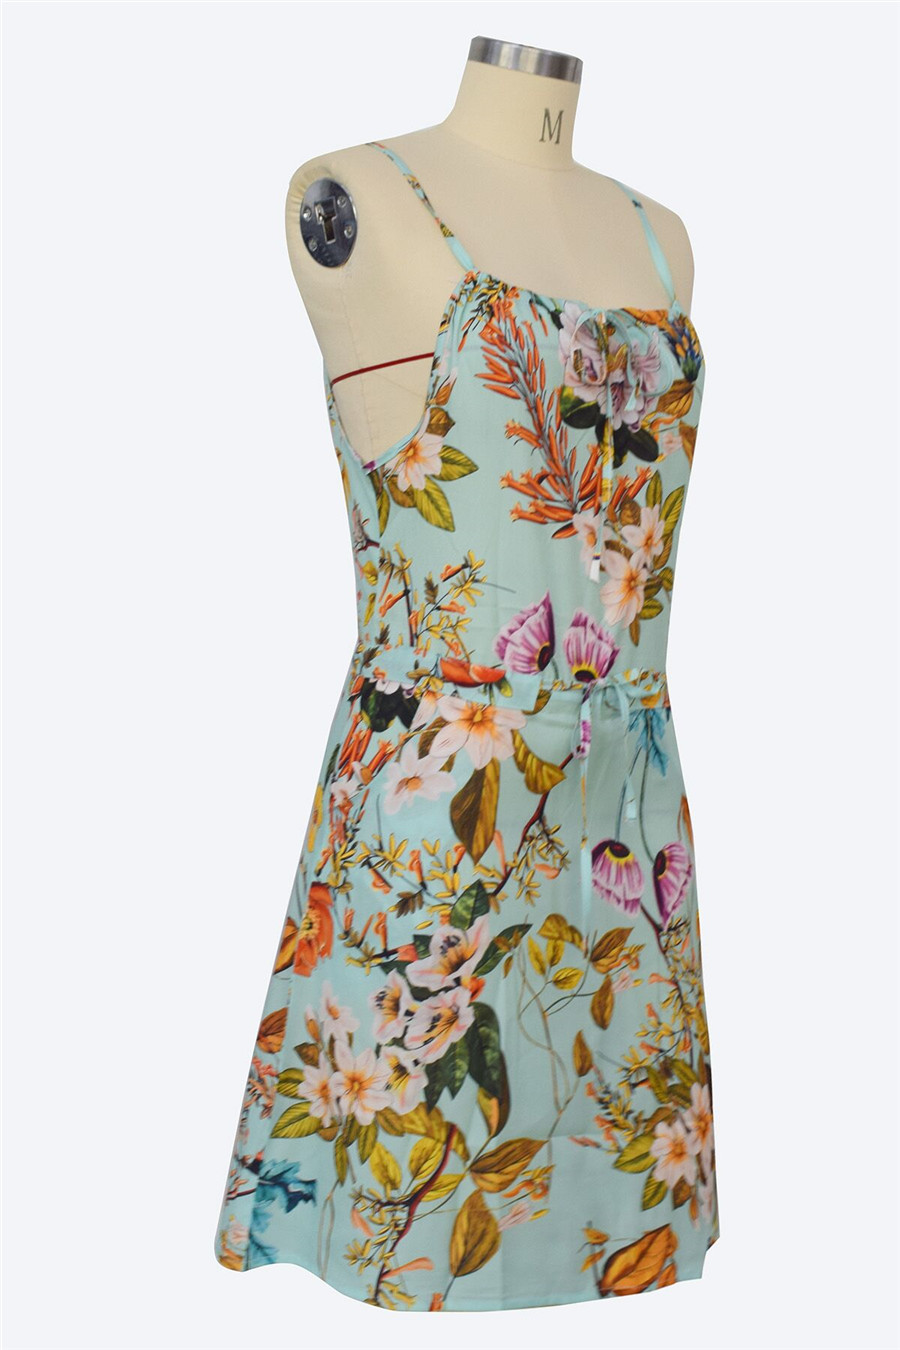 Gladiolus Chiffon Women Summer Dress Spaghetti Strap Floral Print Pocket Sexy Bohemian Beach Dress 2019 Short Ladies Dresses (30)